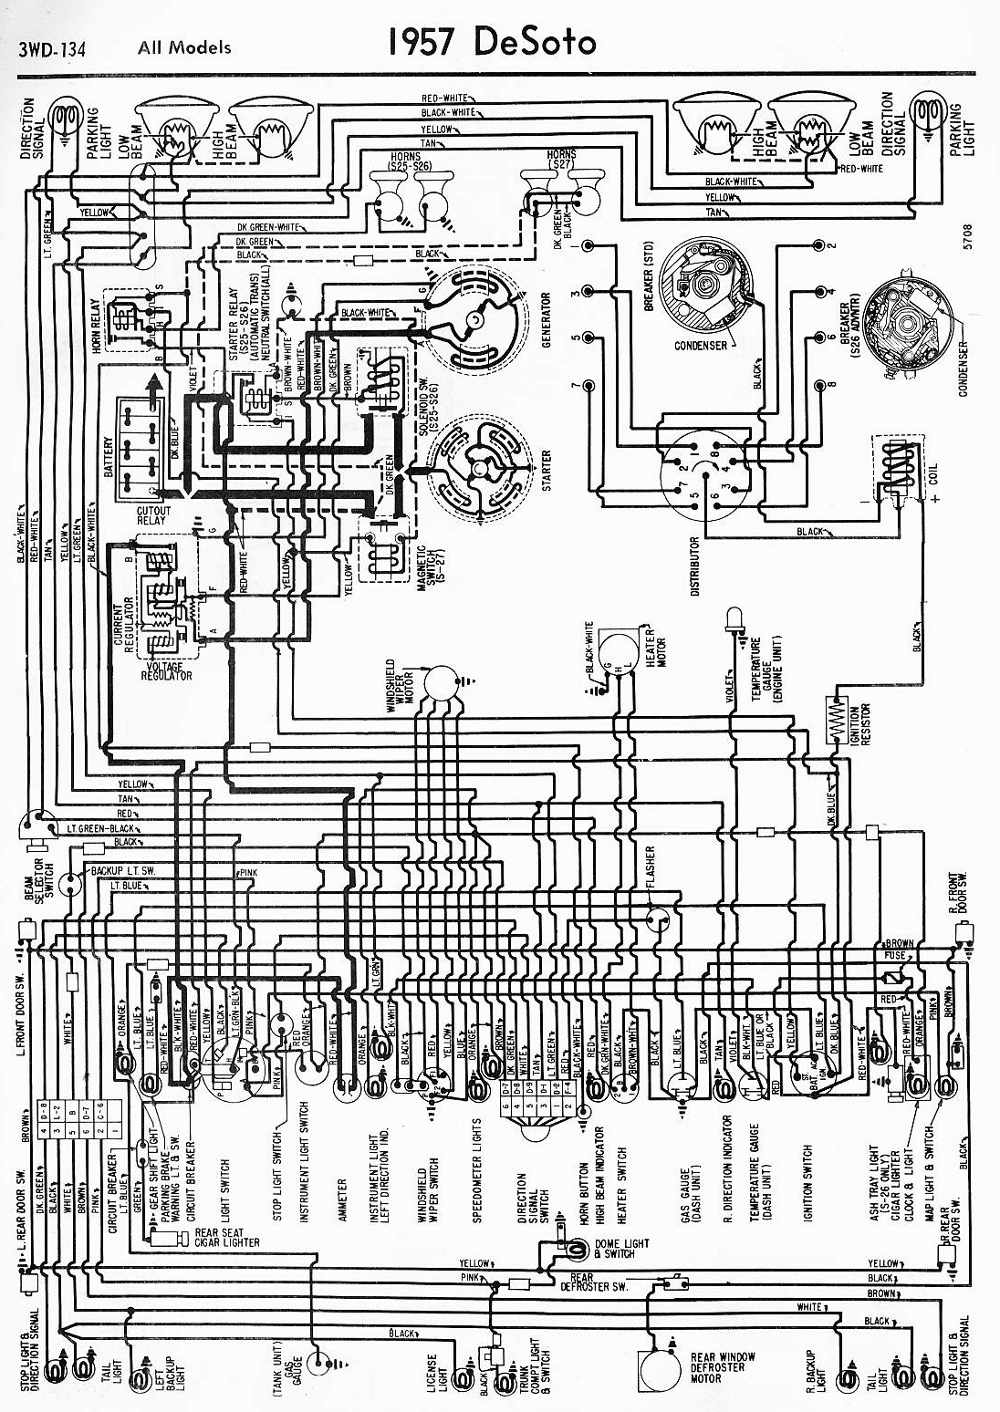 de soto car manuals wiring diagrams pdf fault codes rh automotive manuals net 1958 DeSoto 1959 Lincoln